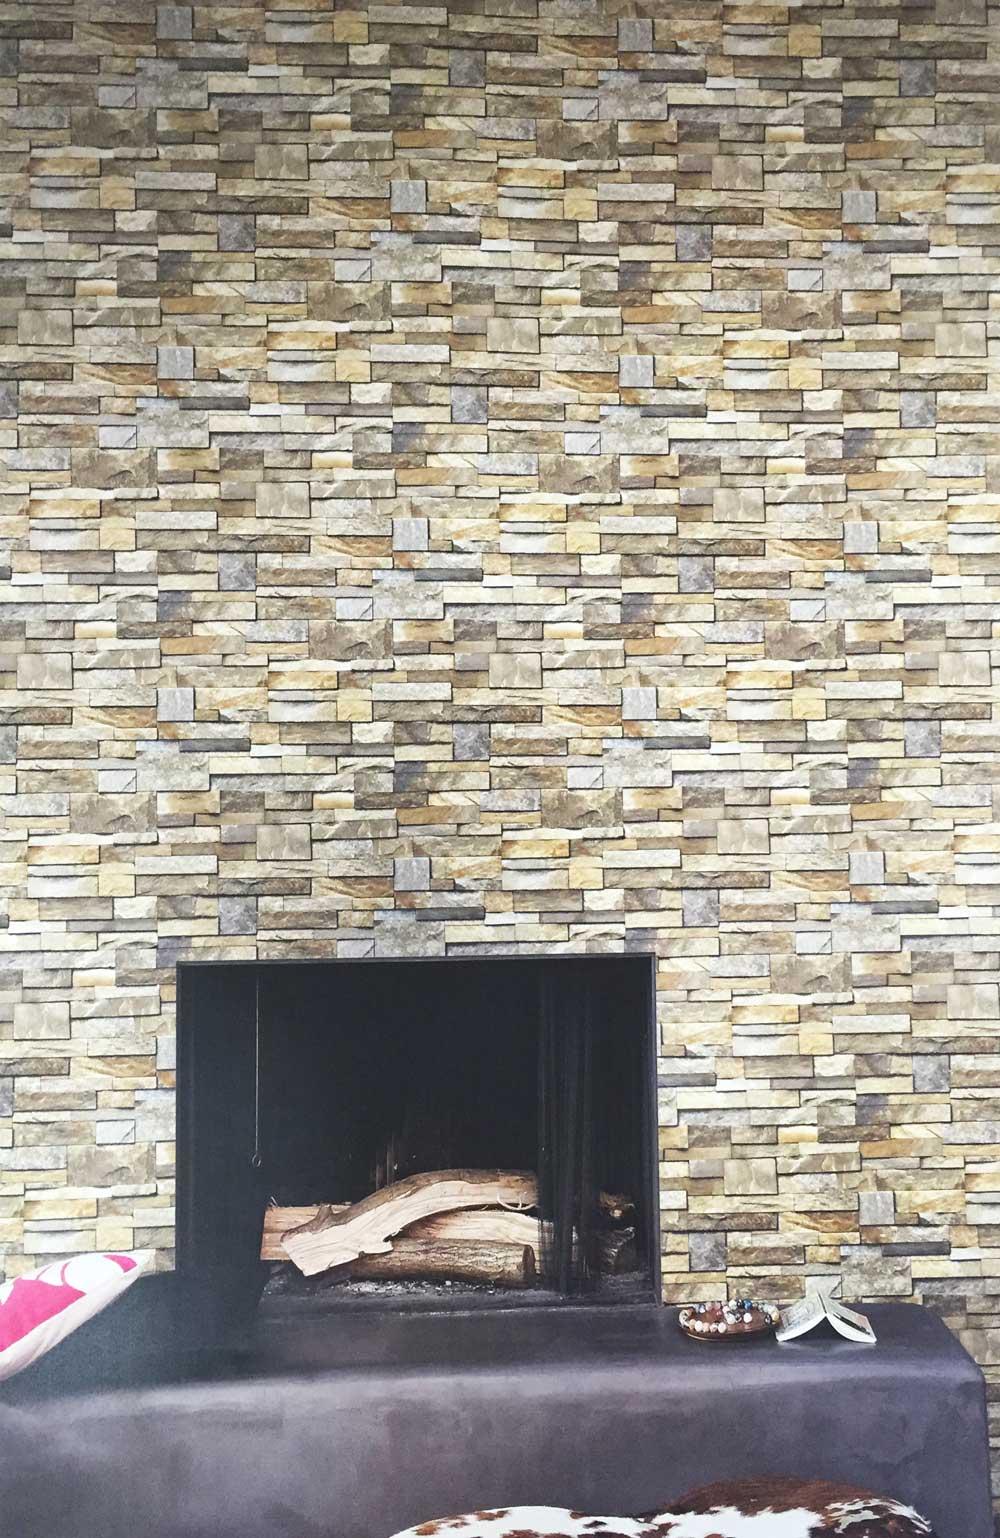 Deco4walls exposed stone brick wallpaper takyin - Commercial wallpaper pasting machine ...